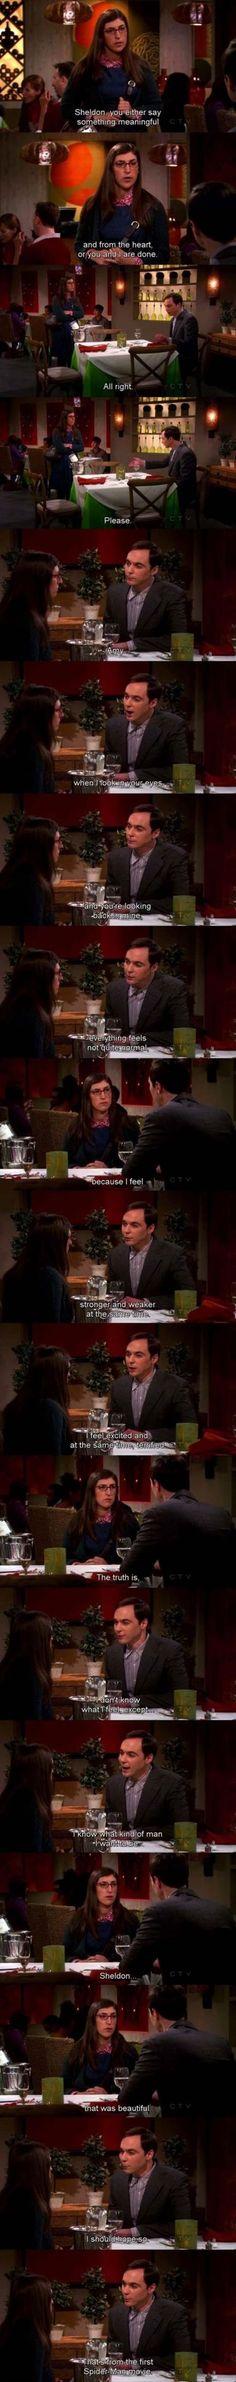 Sheldon haha